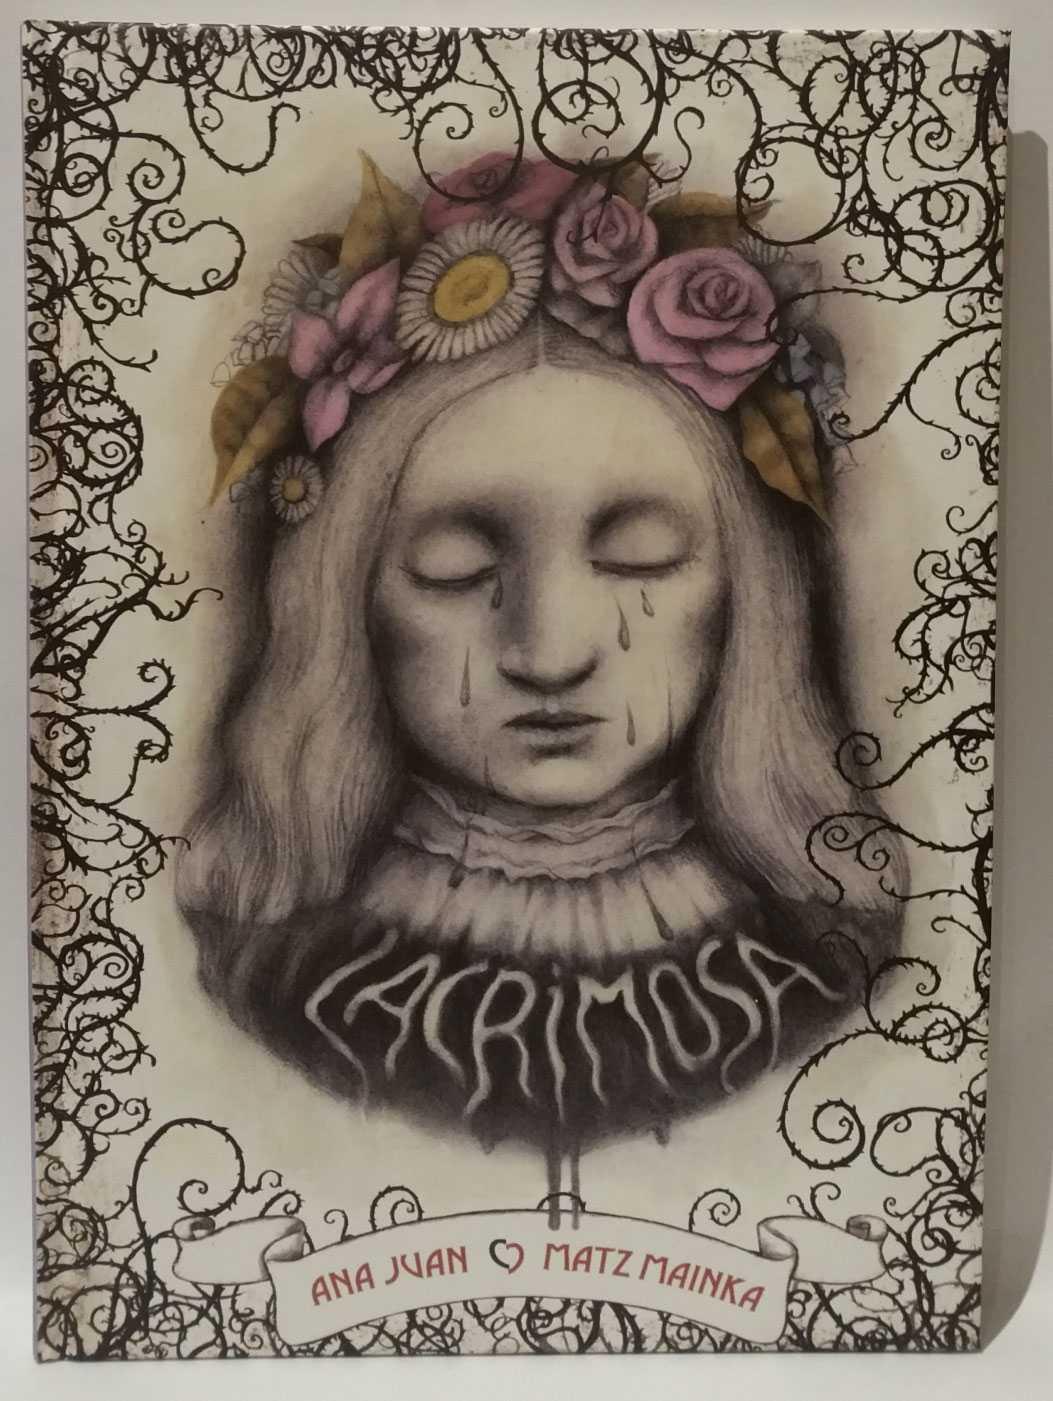 Lacrimosa, Ana Juan; Matz Mainka